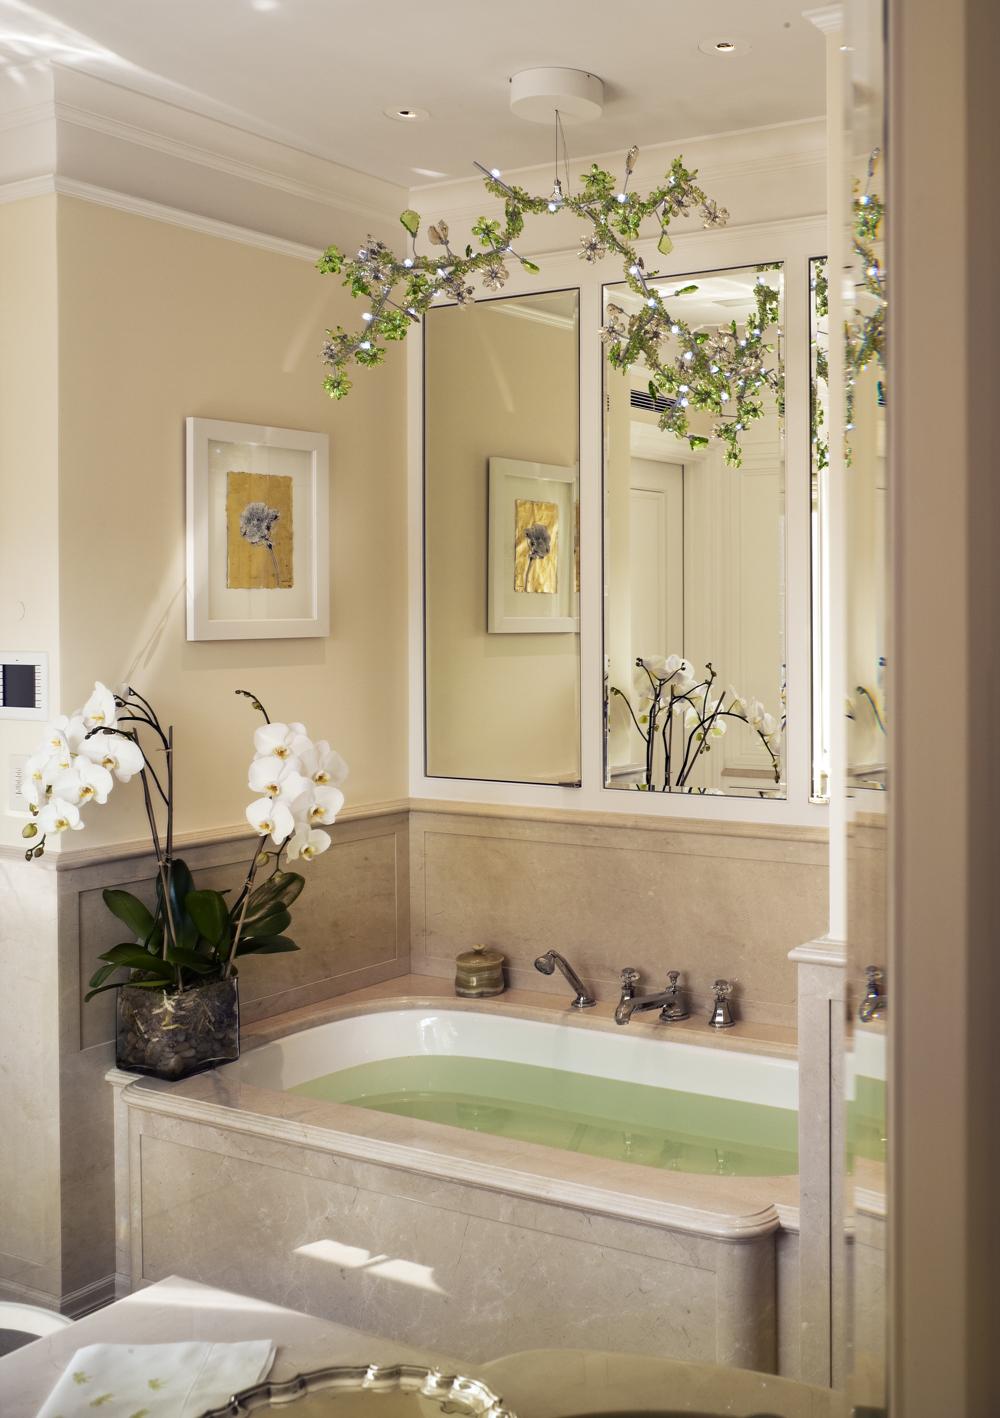 LSI-web-fifth-ave-interior-bathroom.jpg